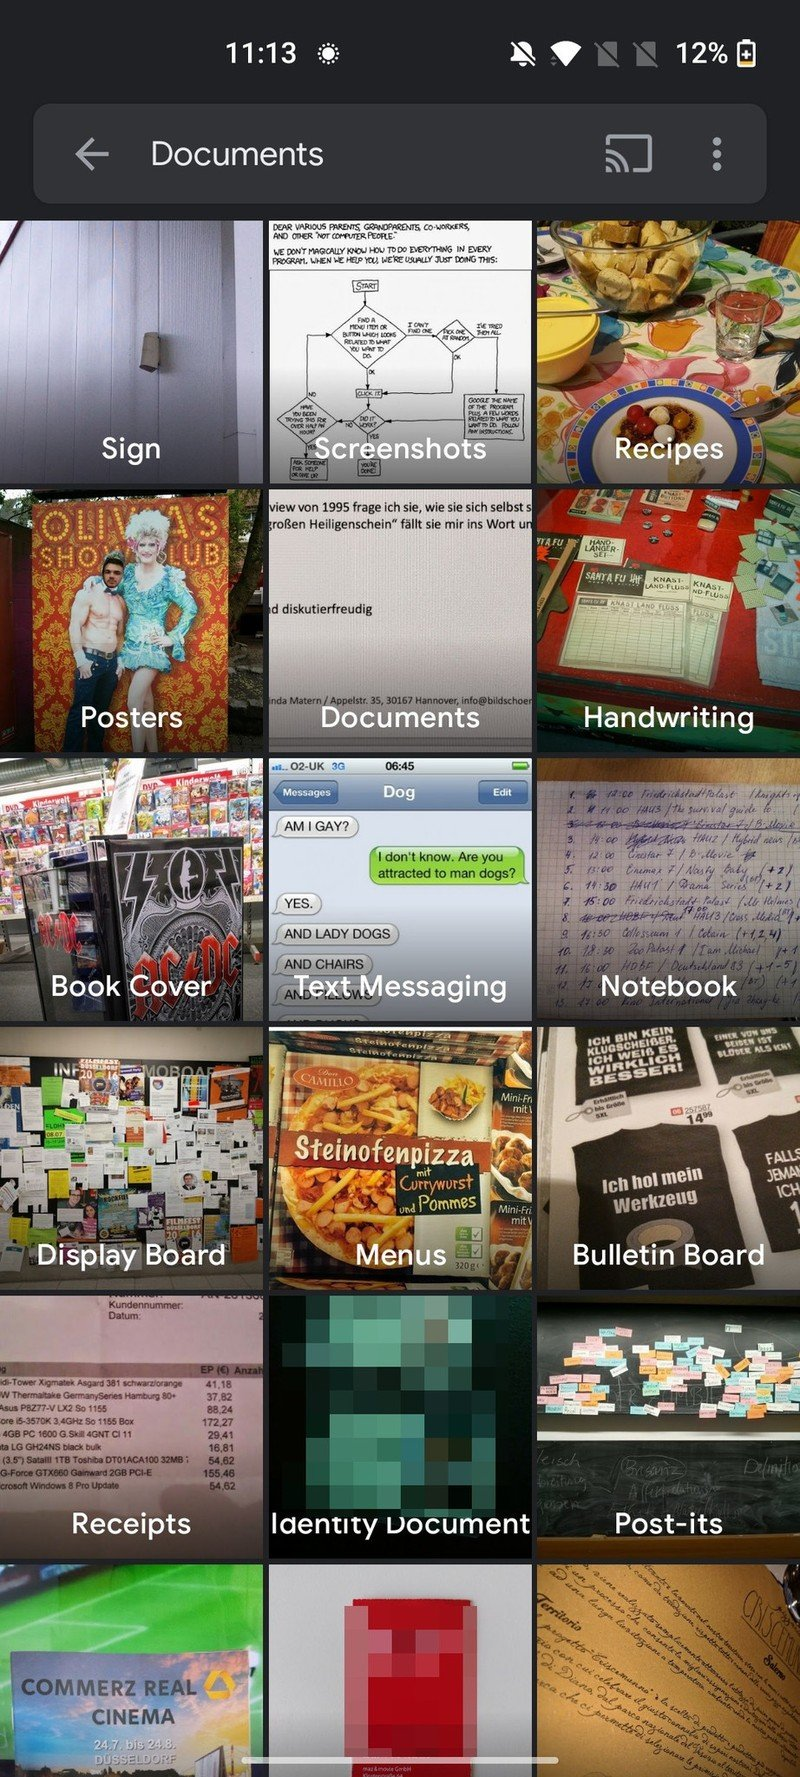 google-photos-documents-examples.jpg